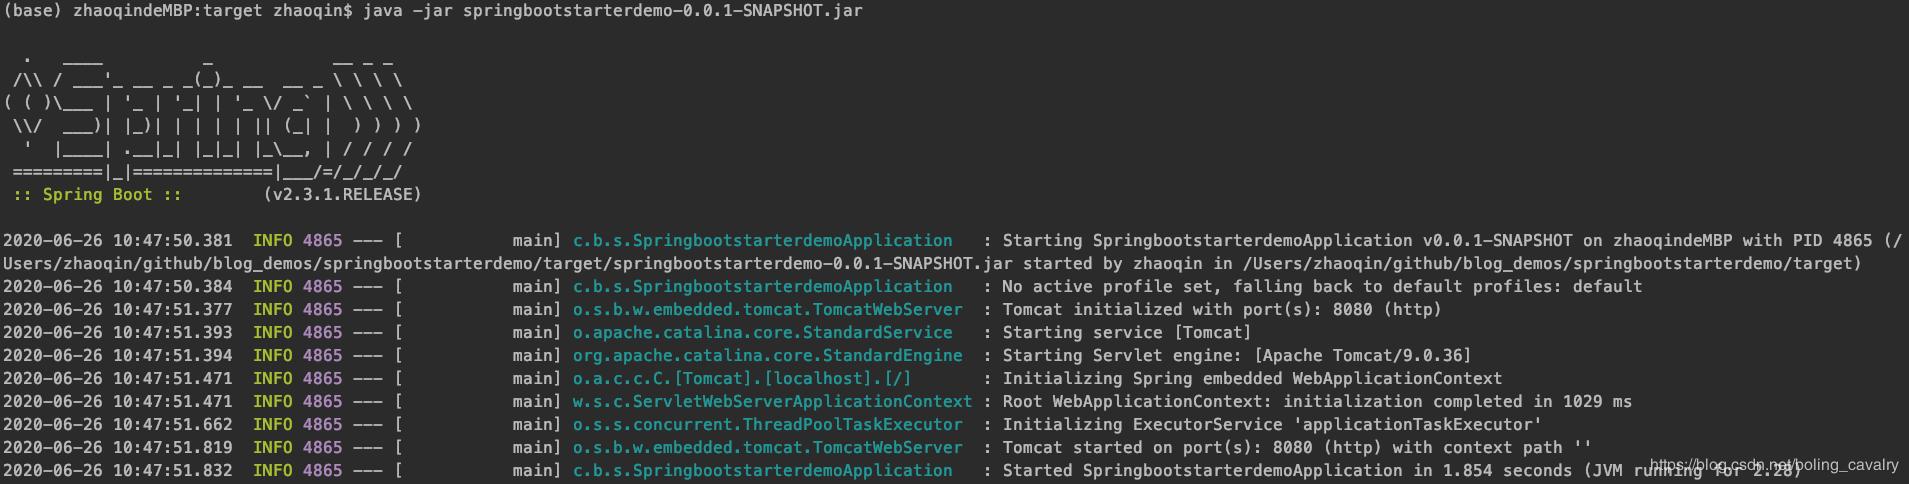 springboot的jar為何能獨立運行